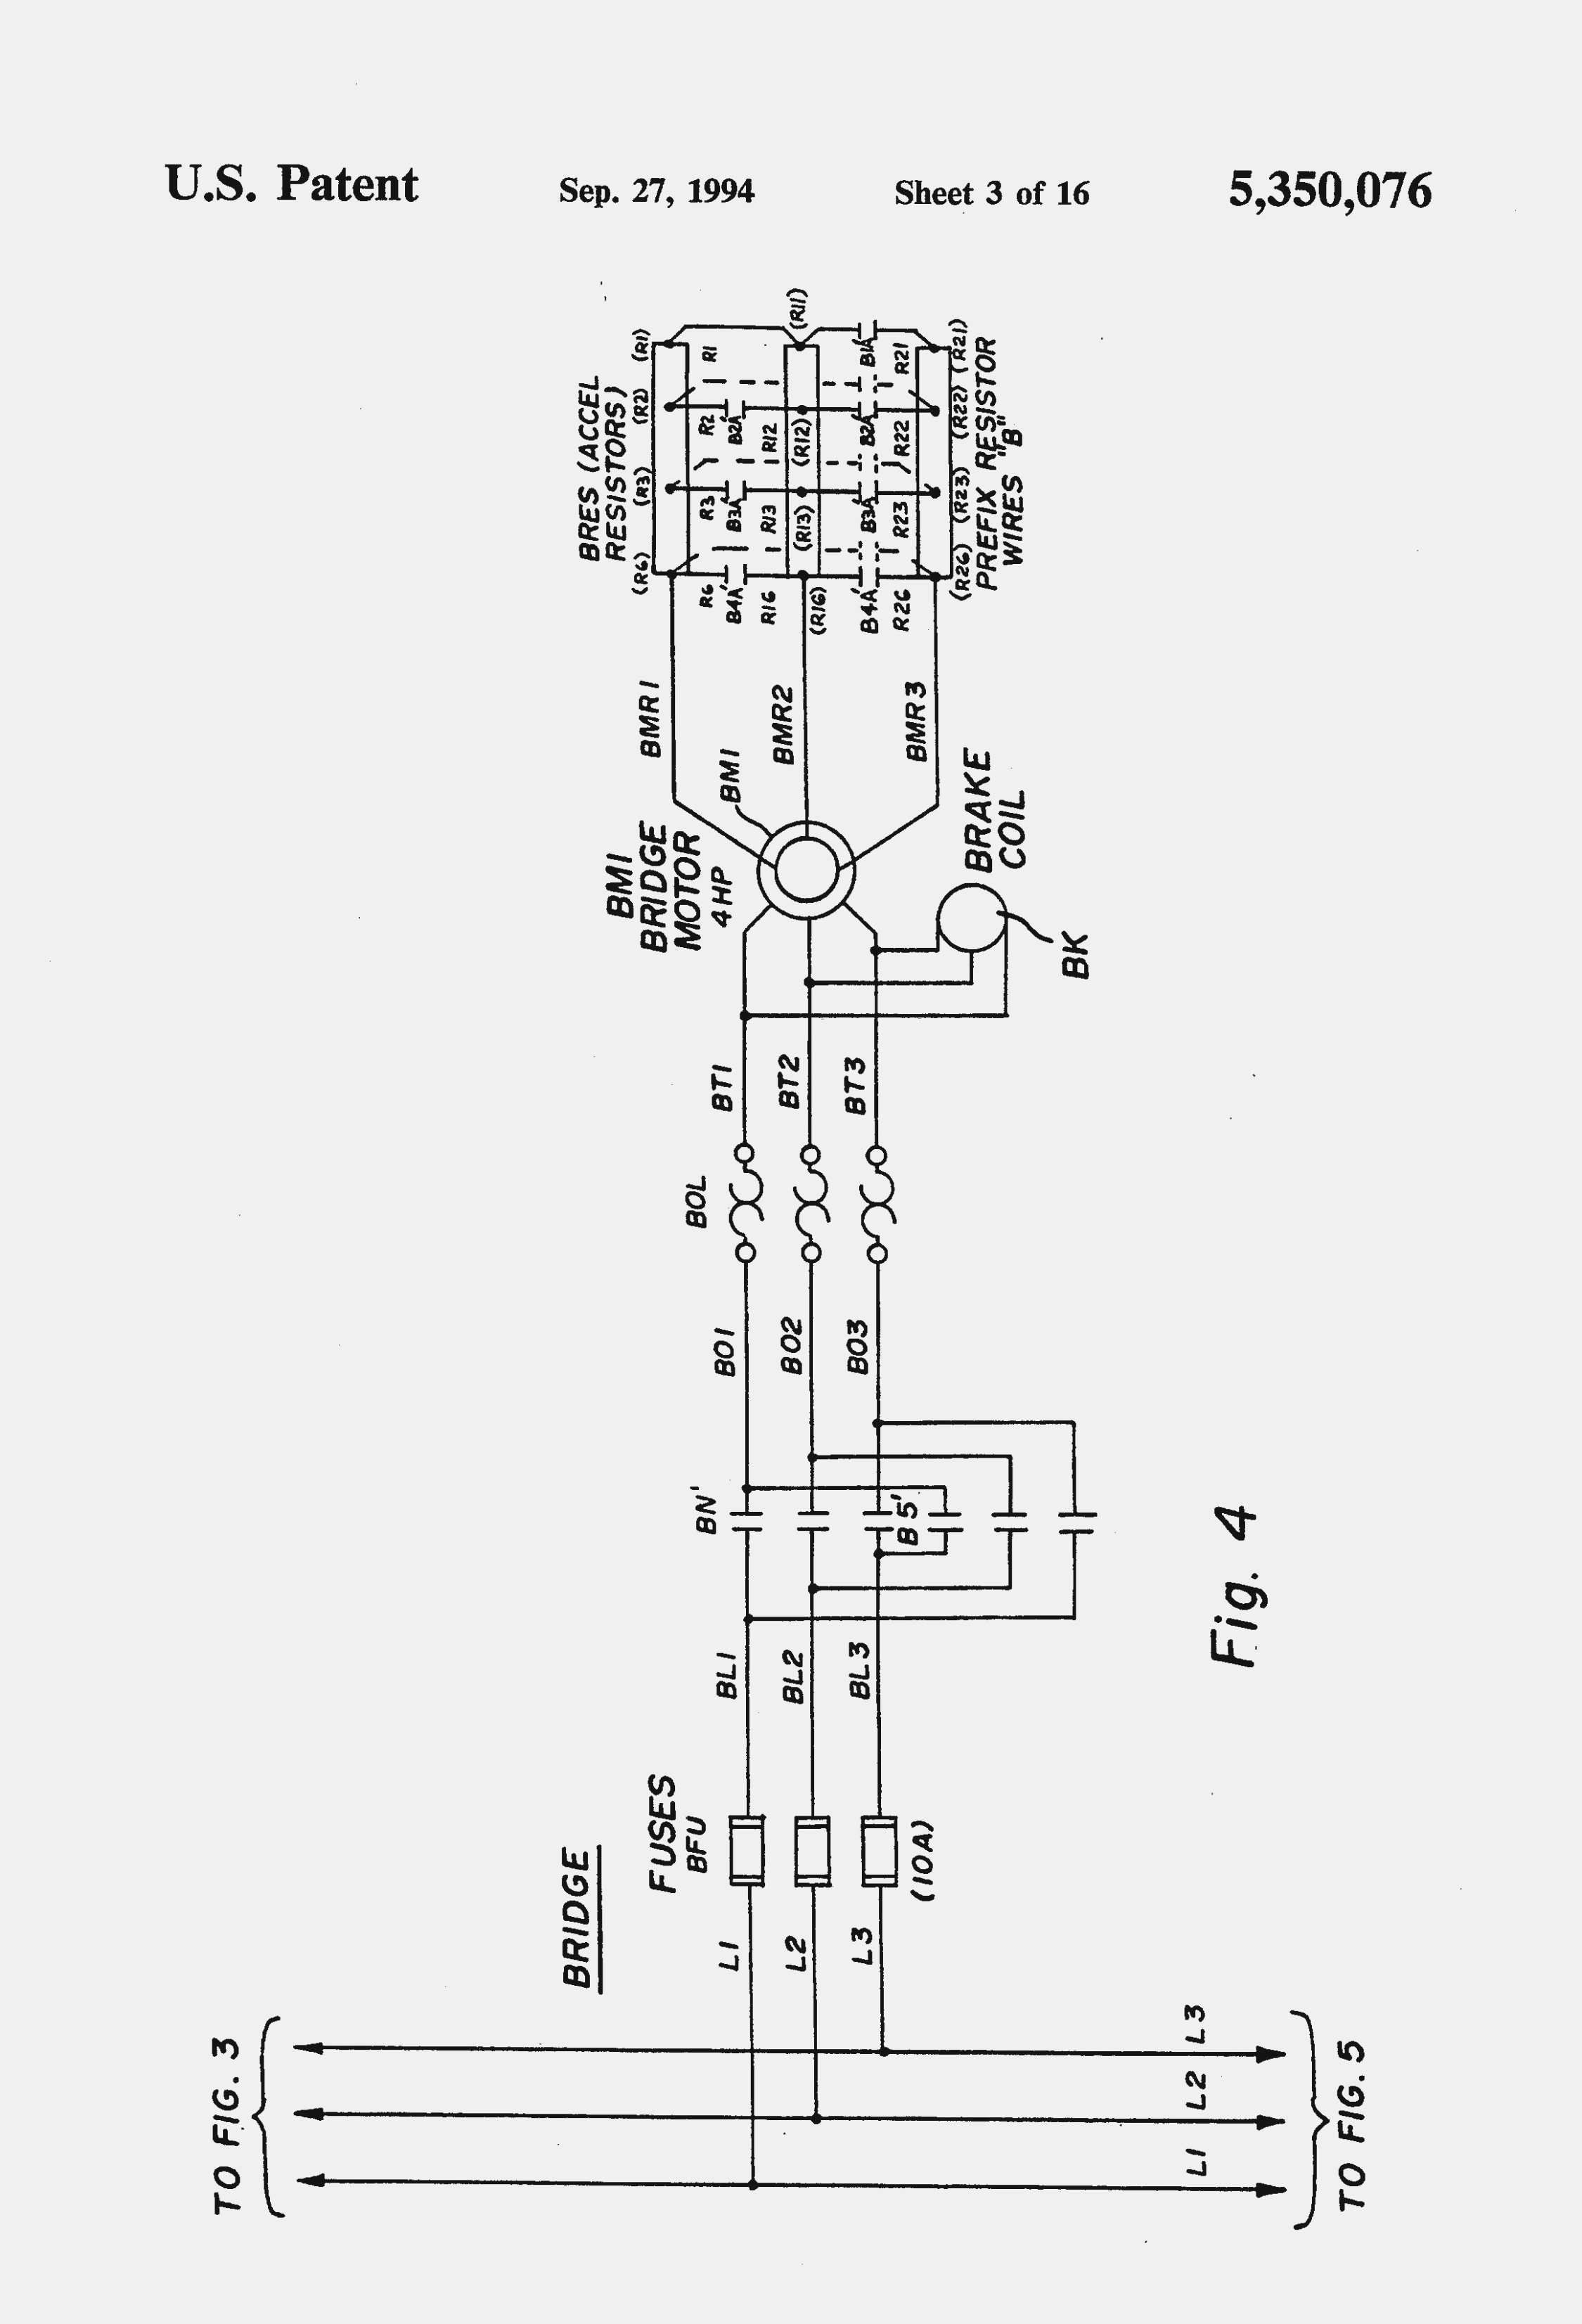 [DIAGRAM_38IU]  WM_4171] Demag Crane Wiring Diagram Schematic Wiring | Demag Wiring Diagram |  | Osoph Emba Mohammedshrine Librar Wiring 101